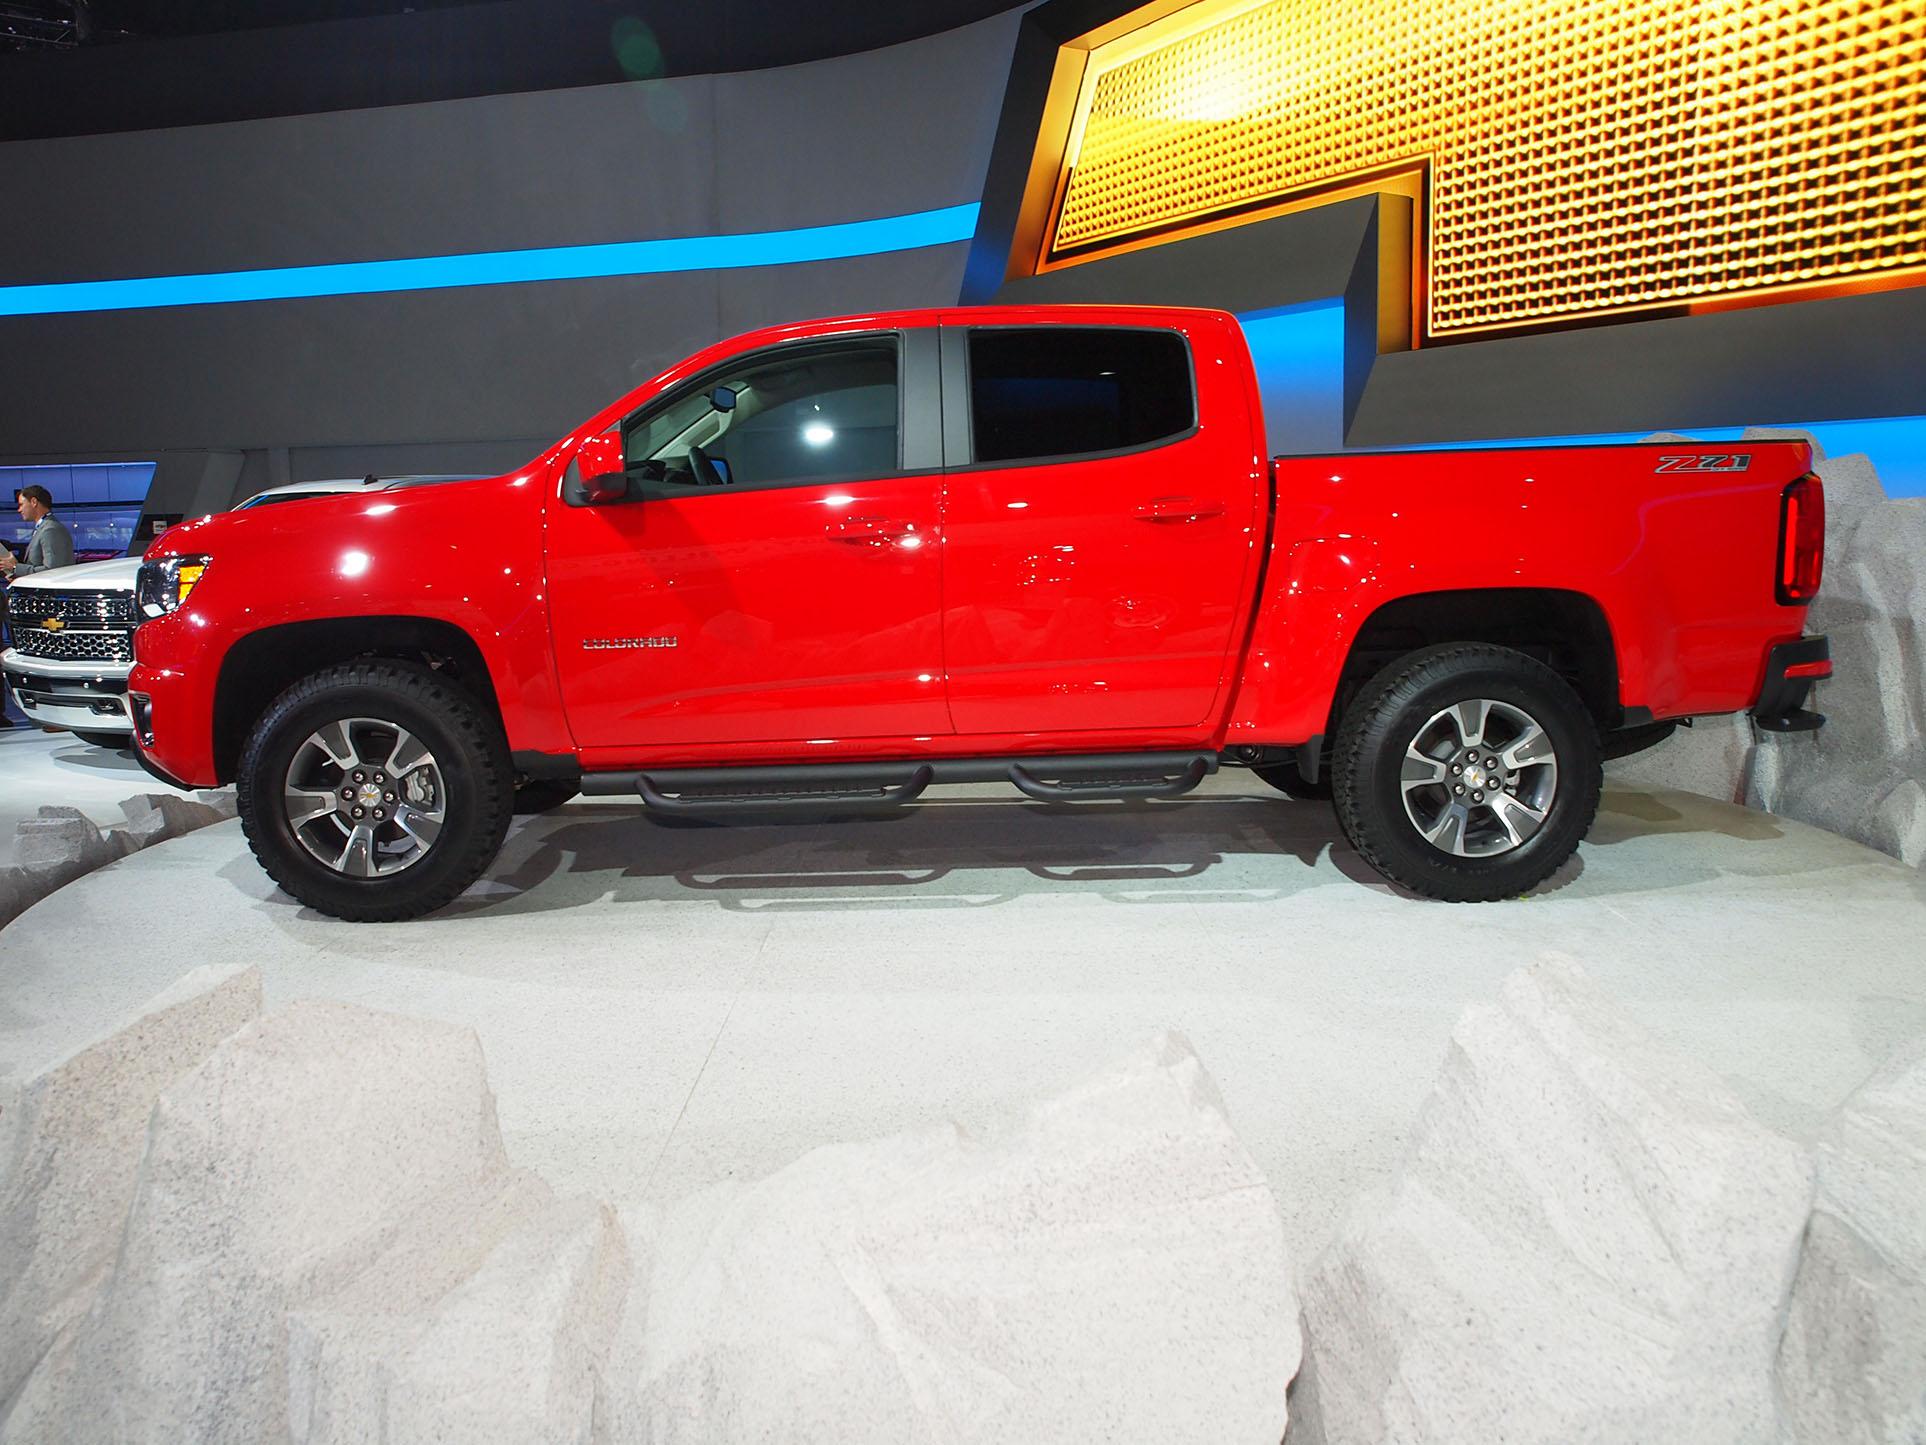 Tacoma V6 Towing Capacity >> 2015 Chevrolet Colorado Shows Up in Los Angeles [Live Photos] - autoevolution